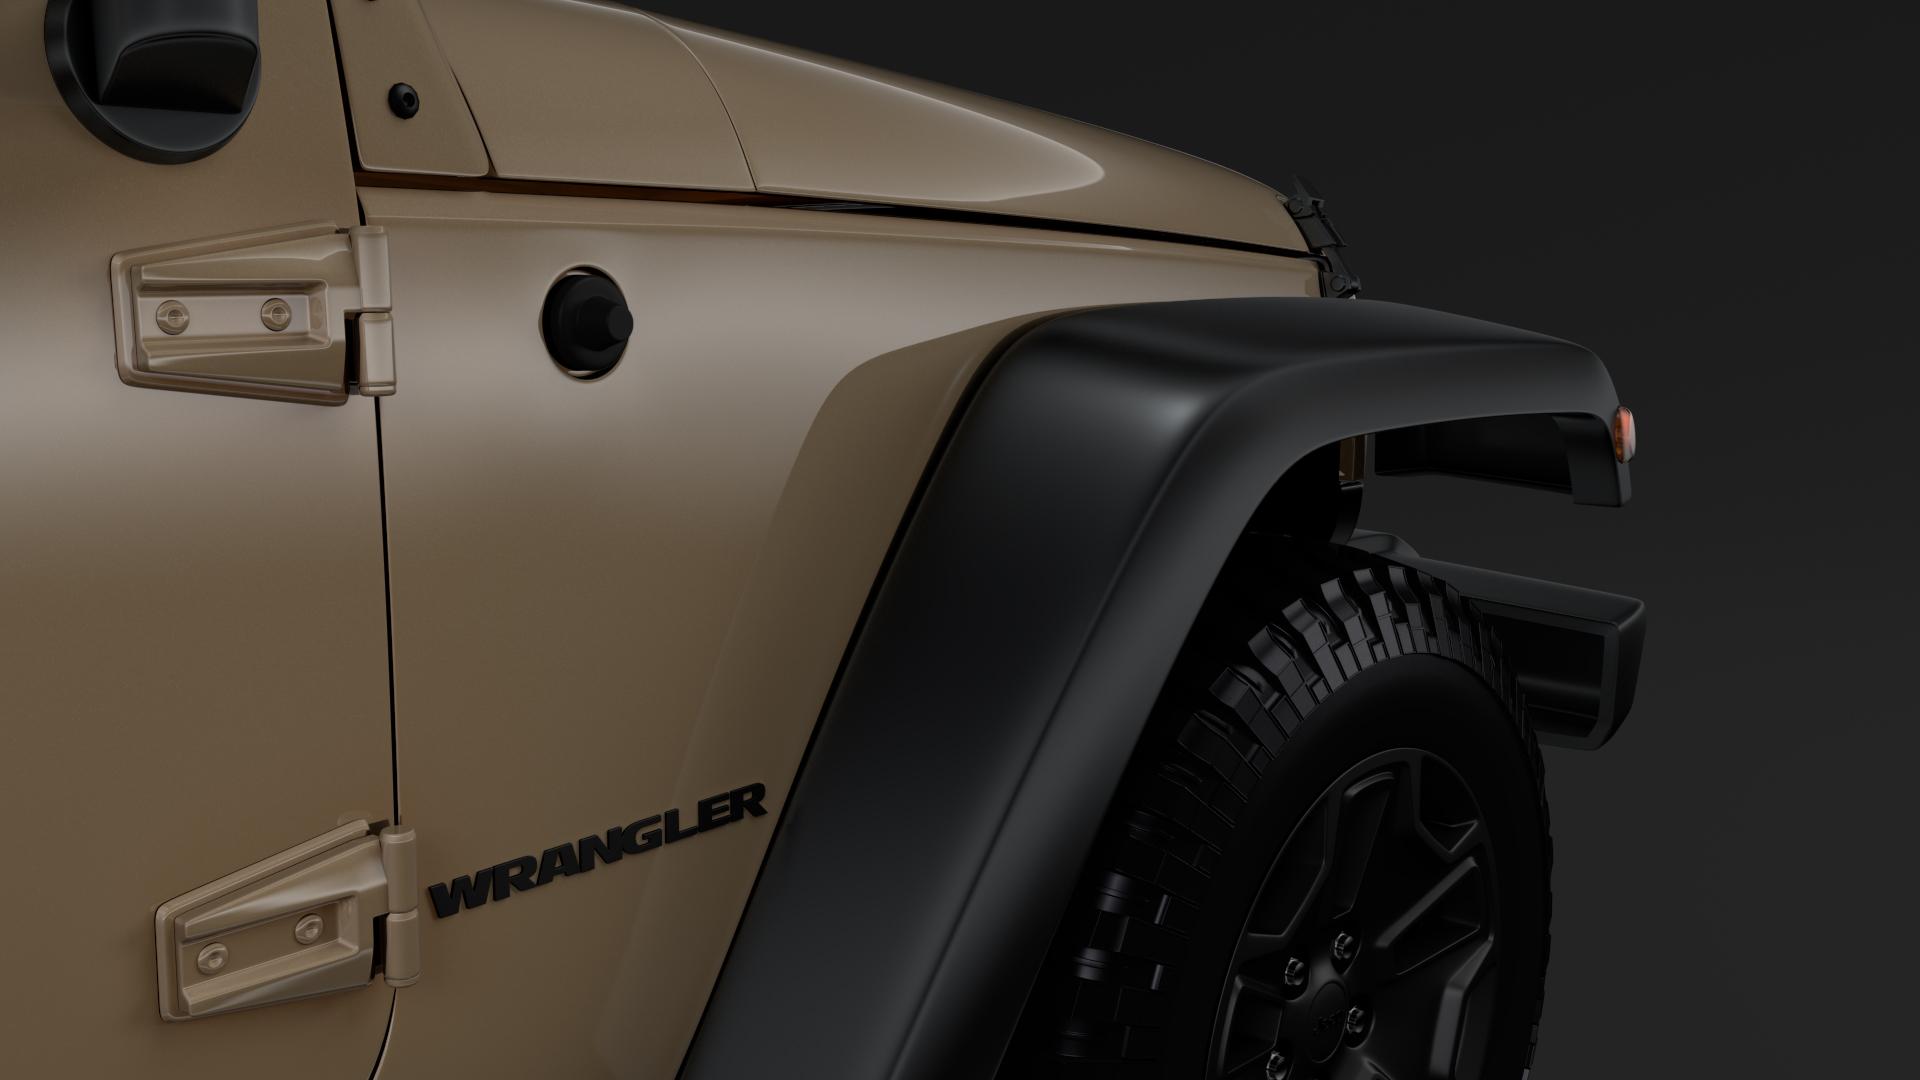 jeep wrangler willys wheeler jk 2017 3d model max fbx c4d lwo ma mb hrc xsi obj 276795